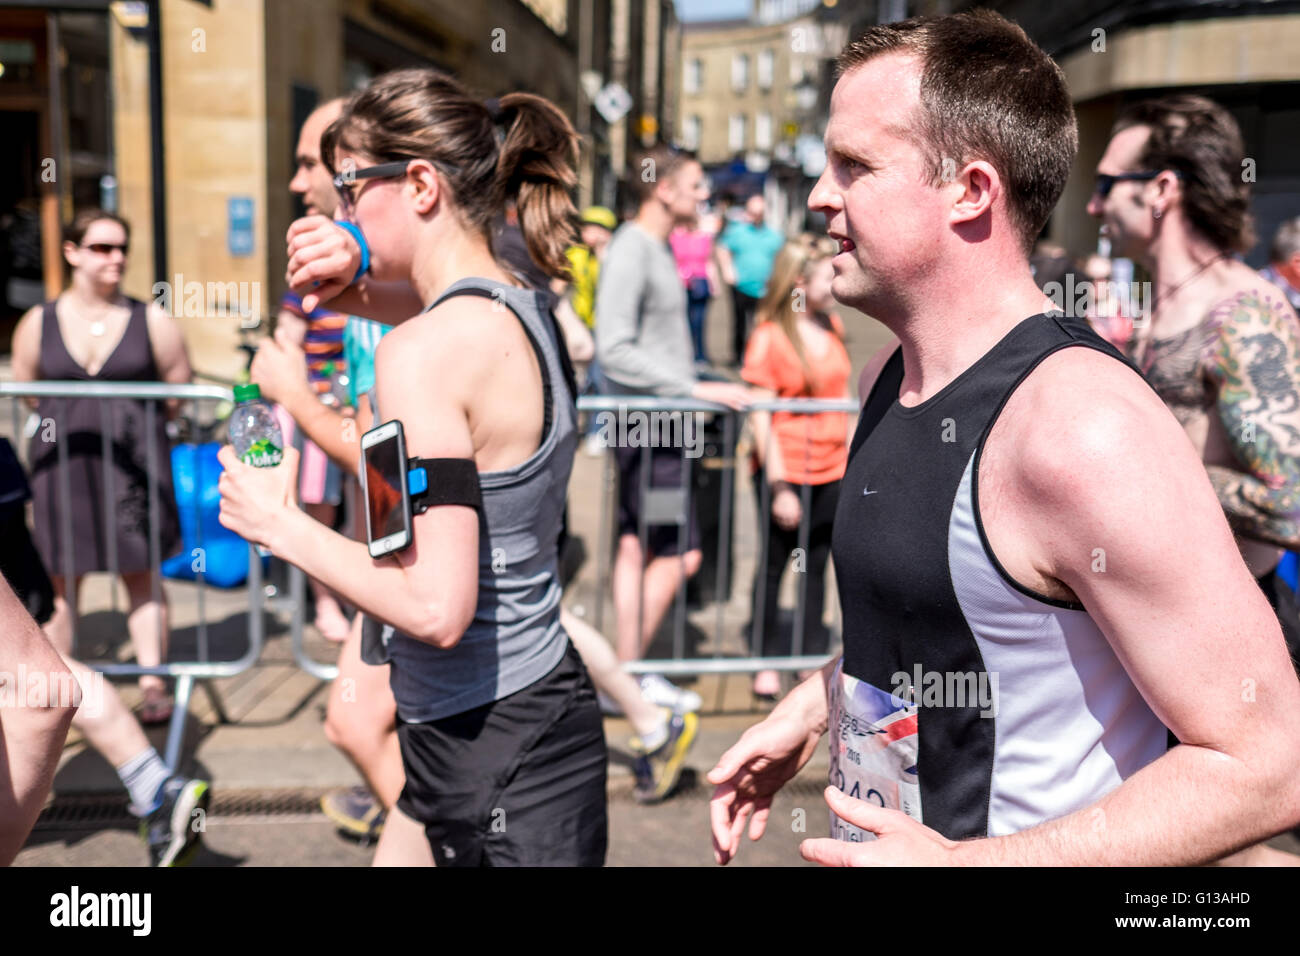 cambridge marathon runners run - Stock Image